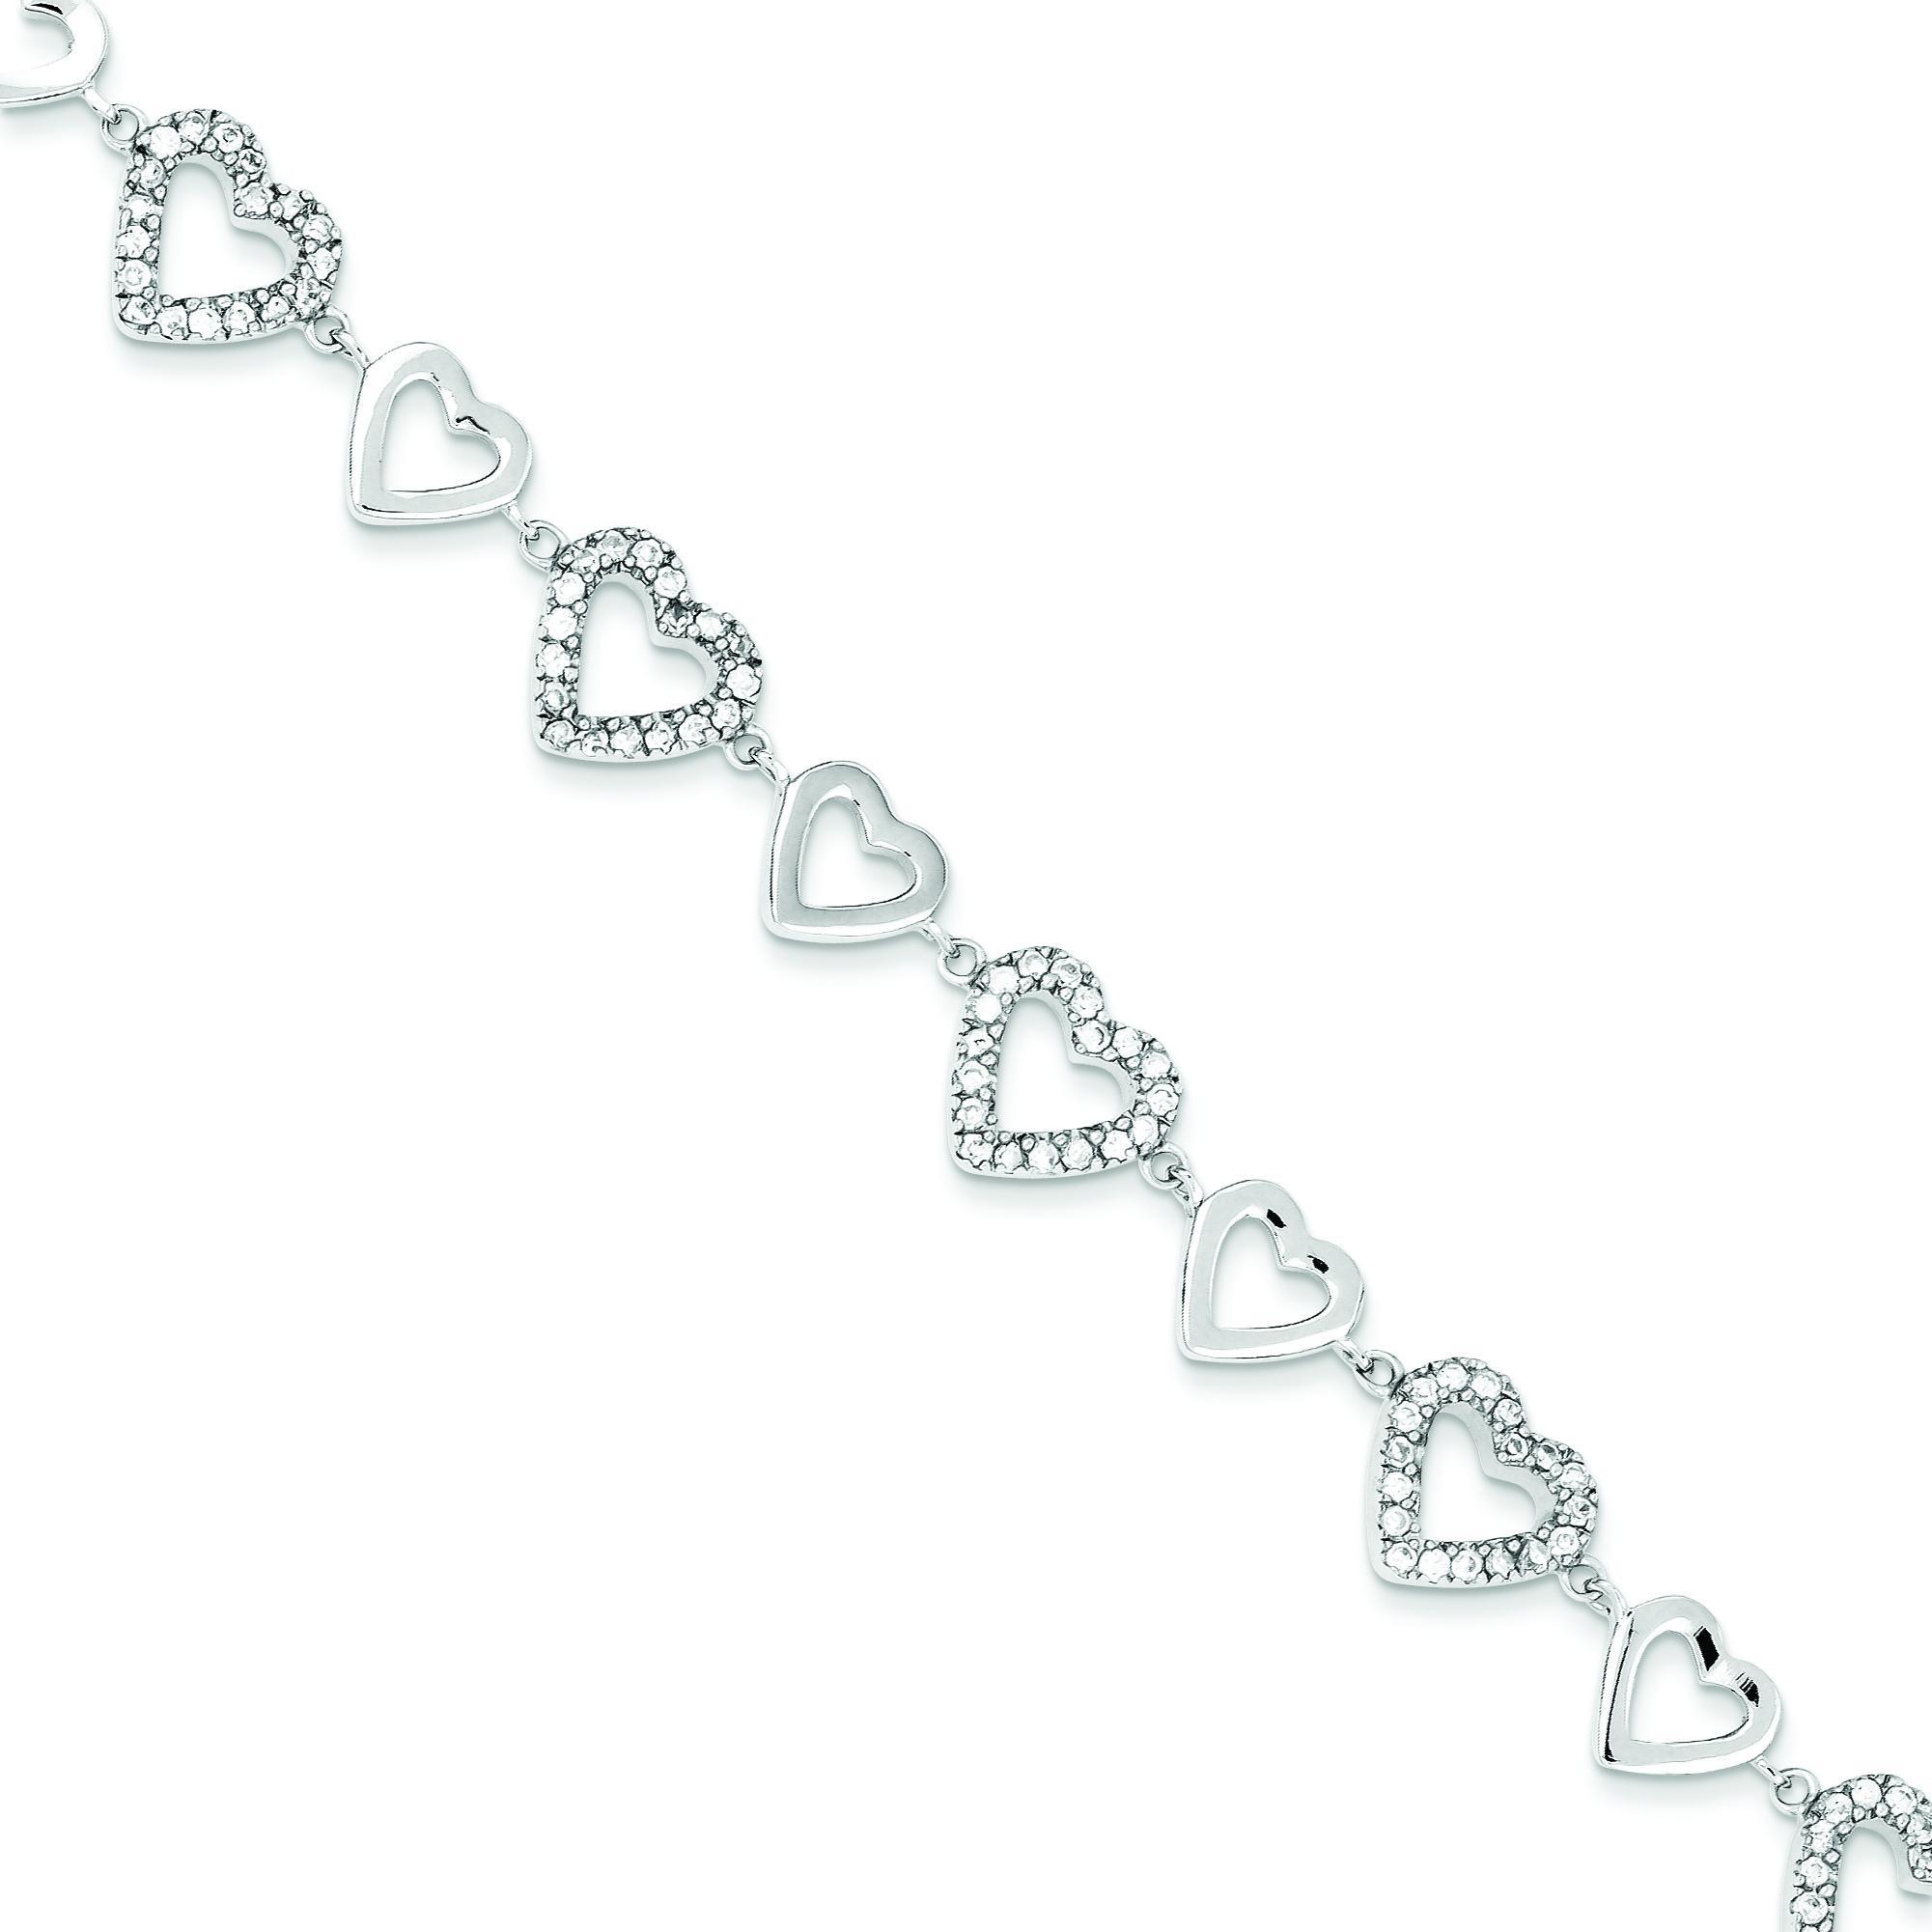 Polished CZ Hearts Bracelet in Sterling Silver